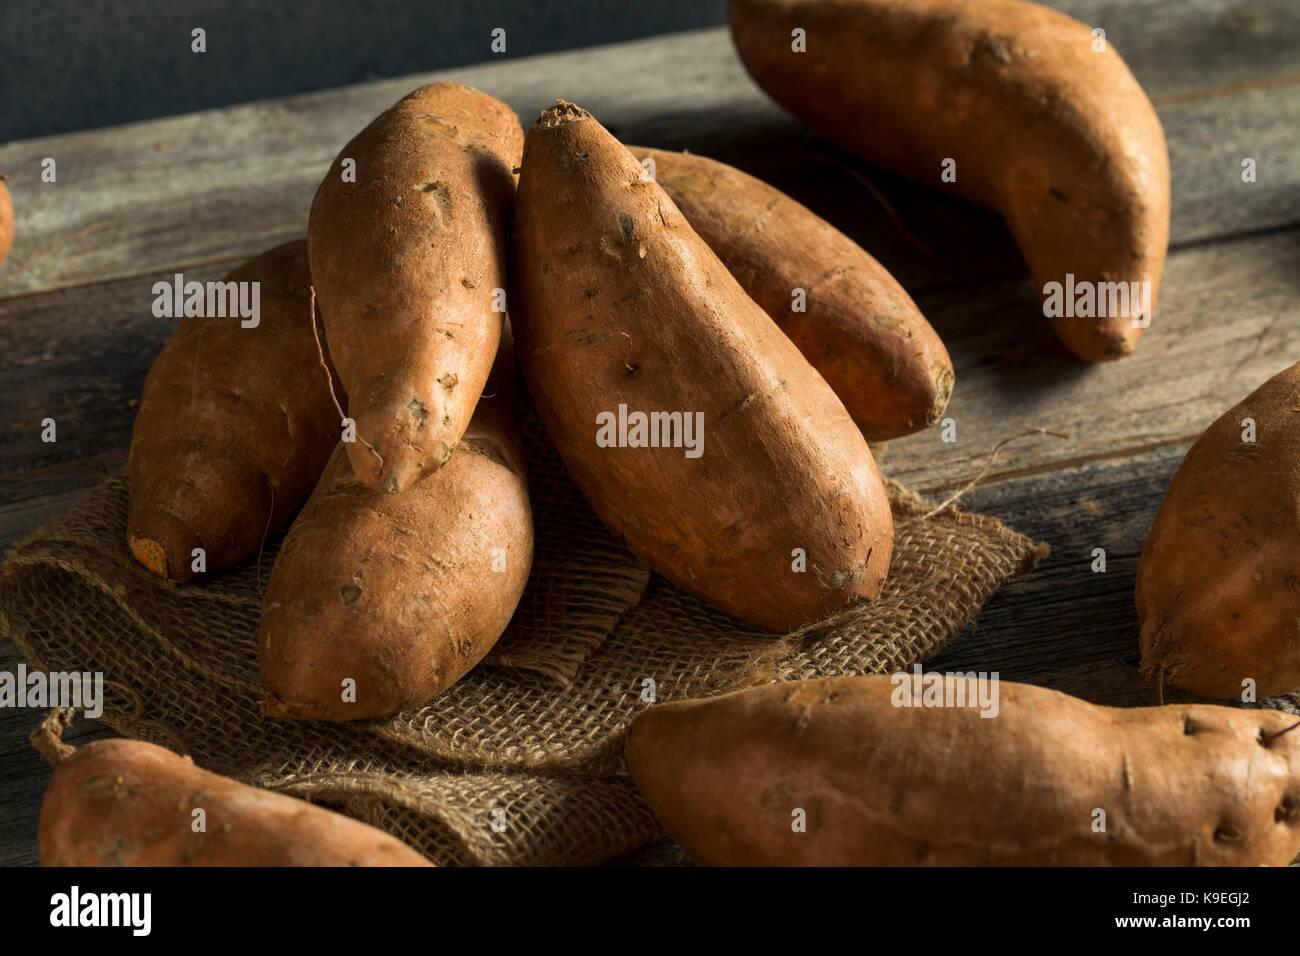 Raw Orange Organic Sweet Potato Yams Ready To Cook Stock Photo